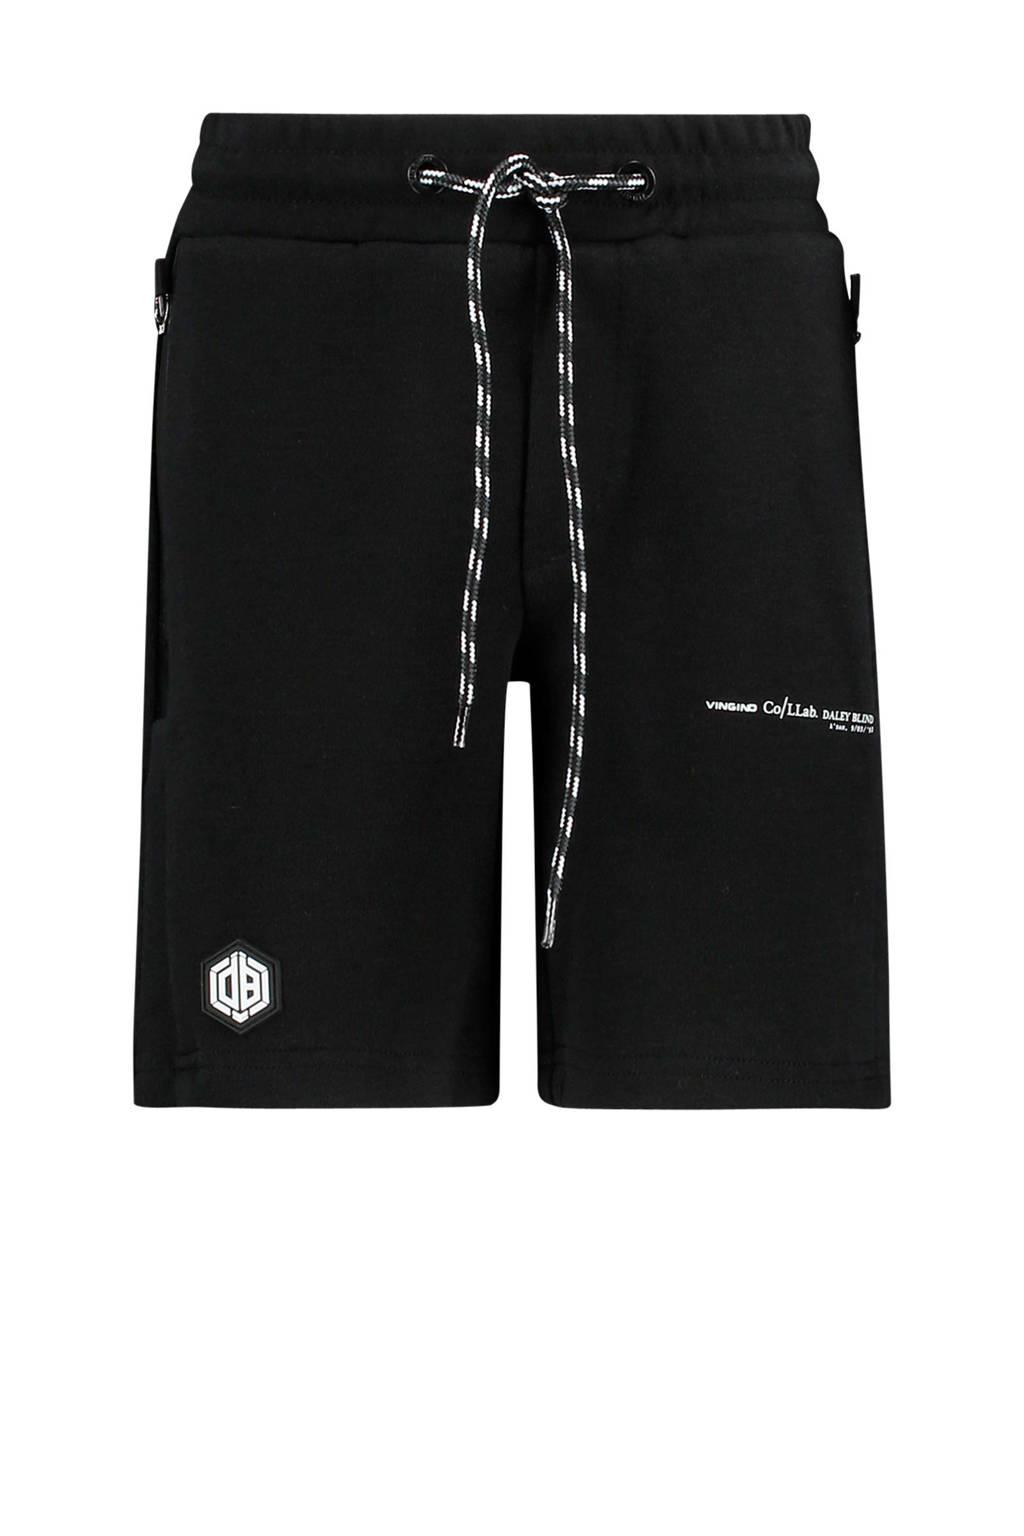 Vingino sweatshort Reggiani van Daley Blind zwart, Zwart